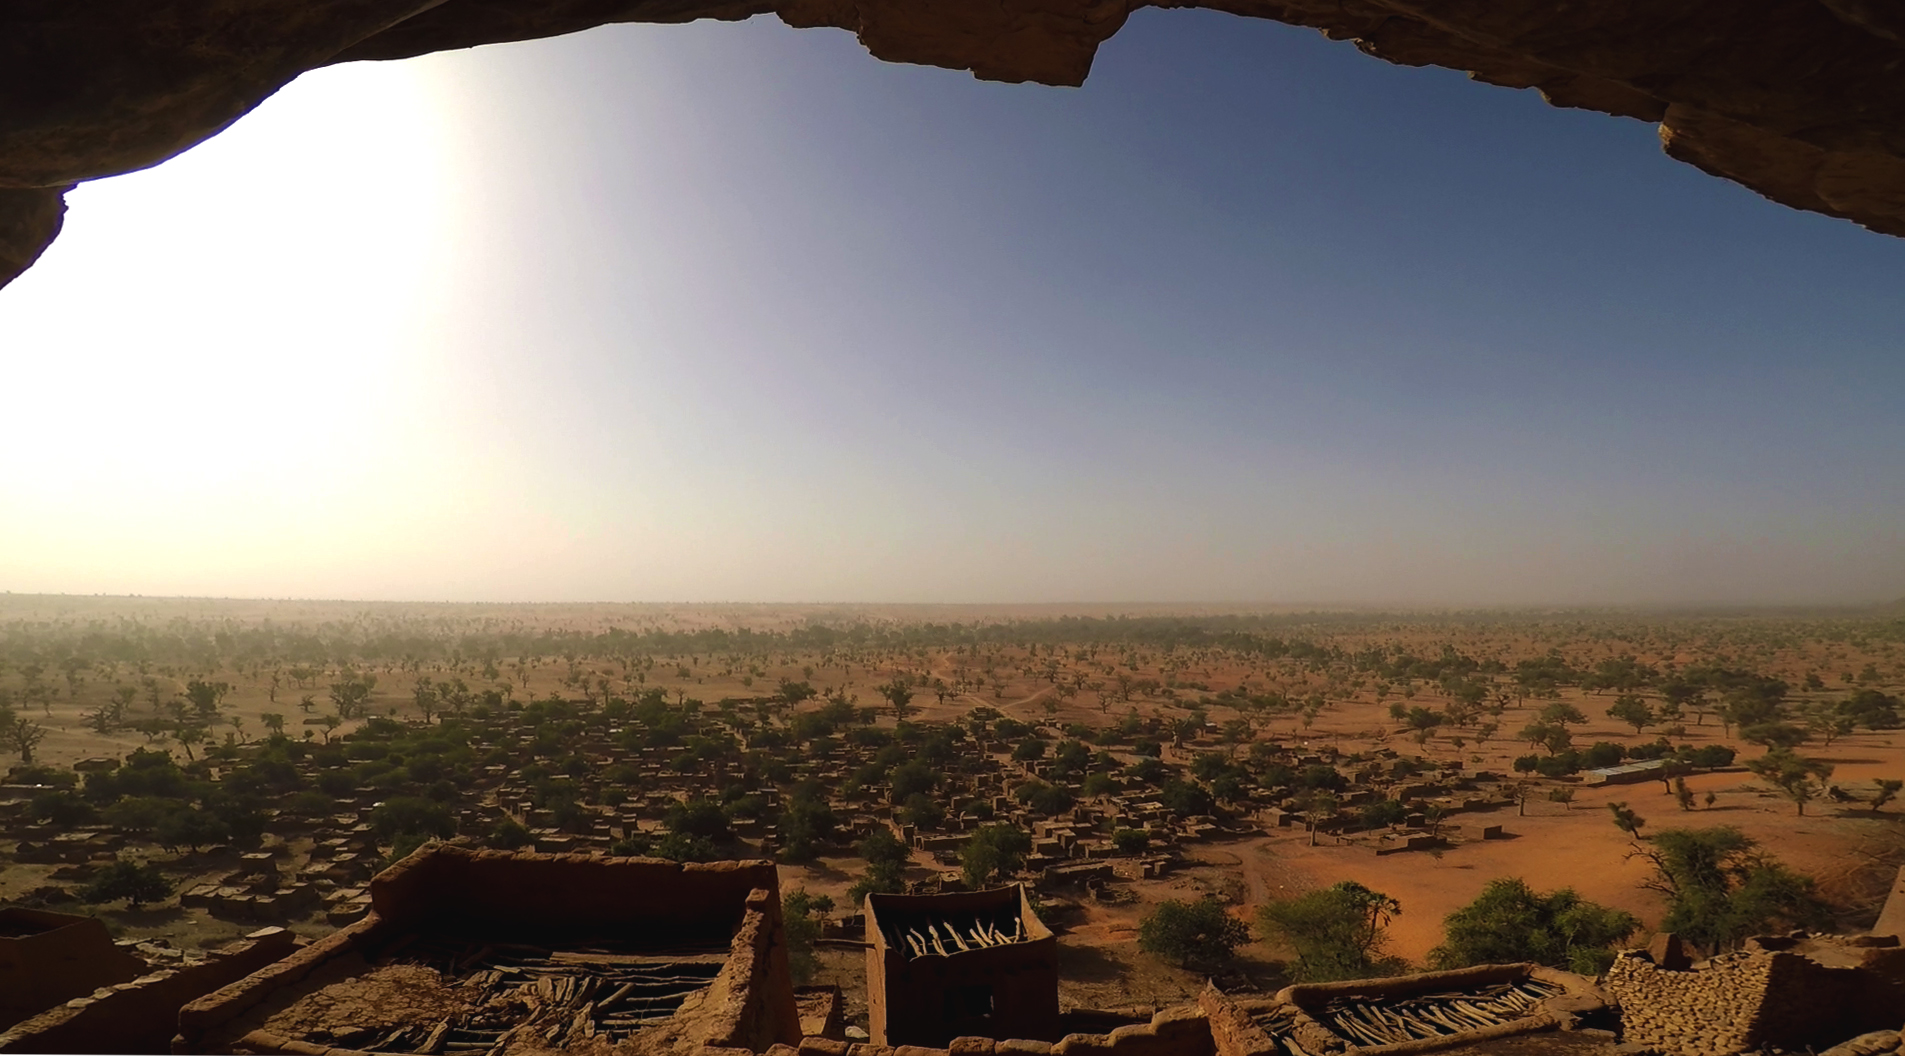 caverna telem dogon pablocaminante - Malí 7, País Dogon IV: Tellem